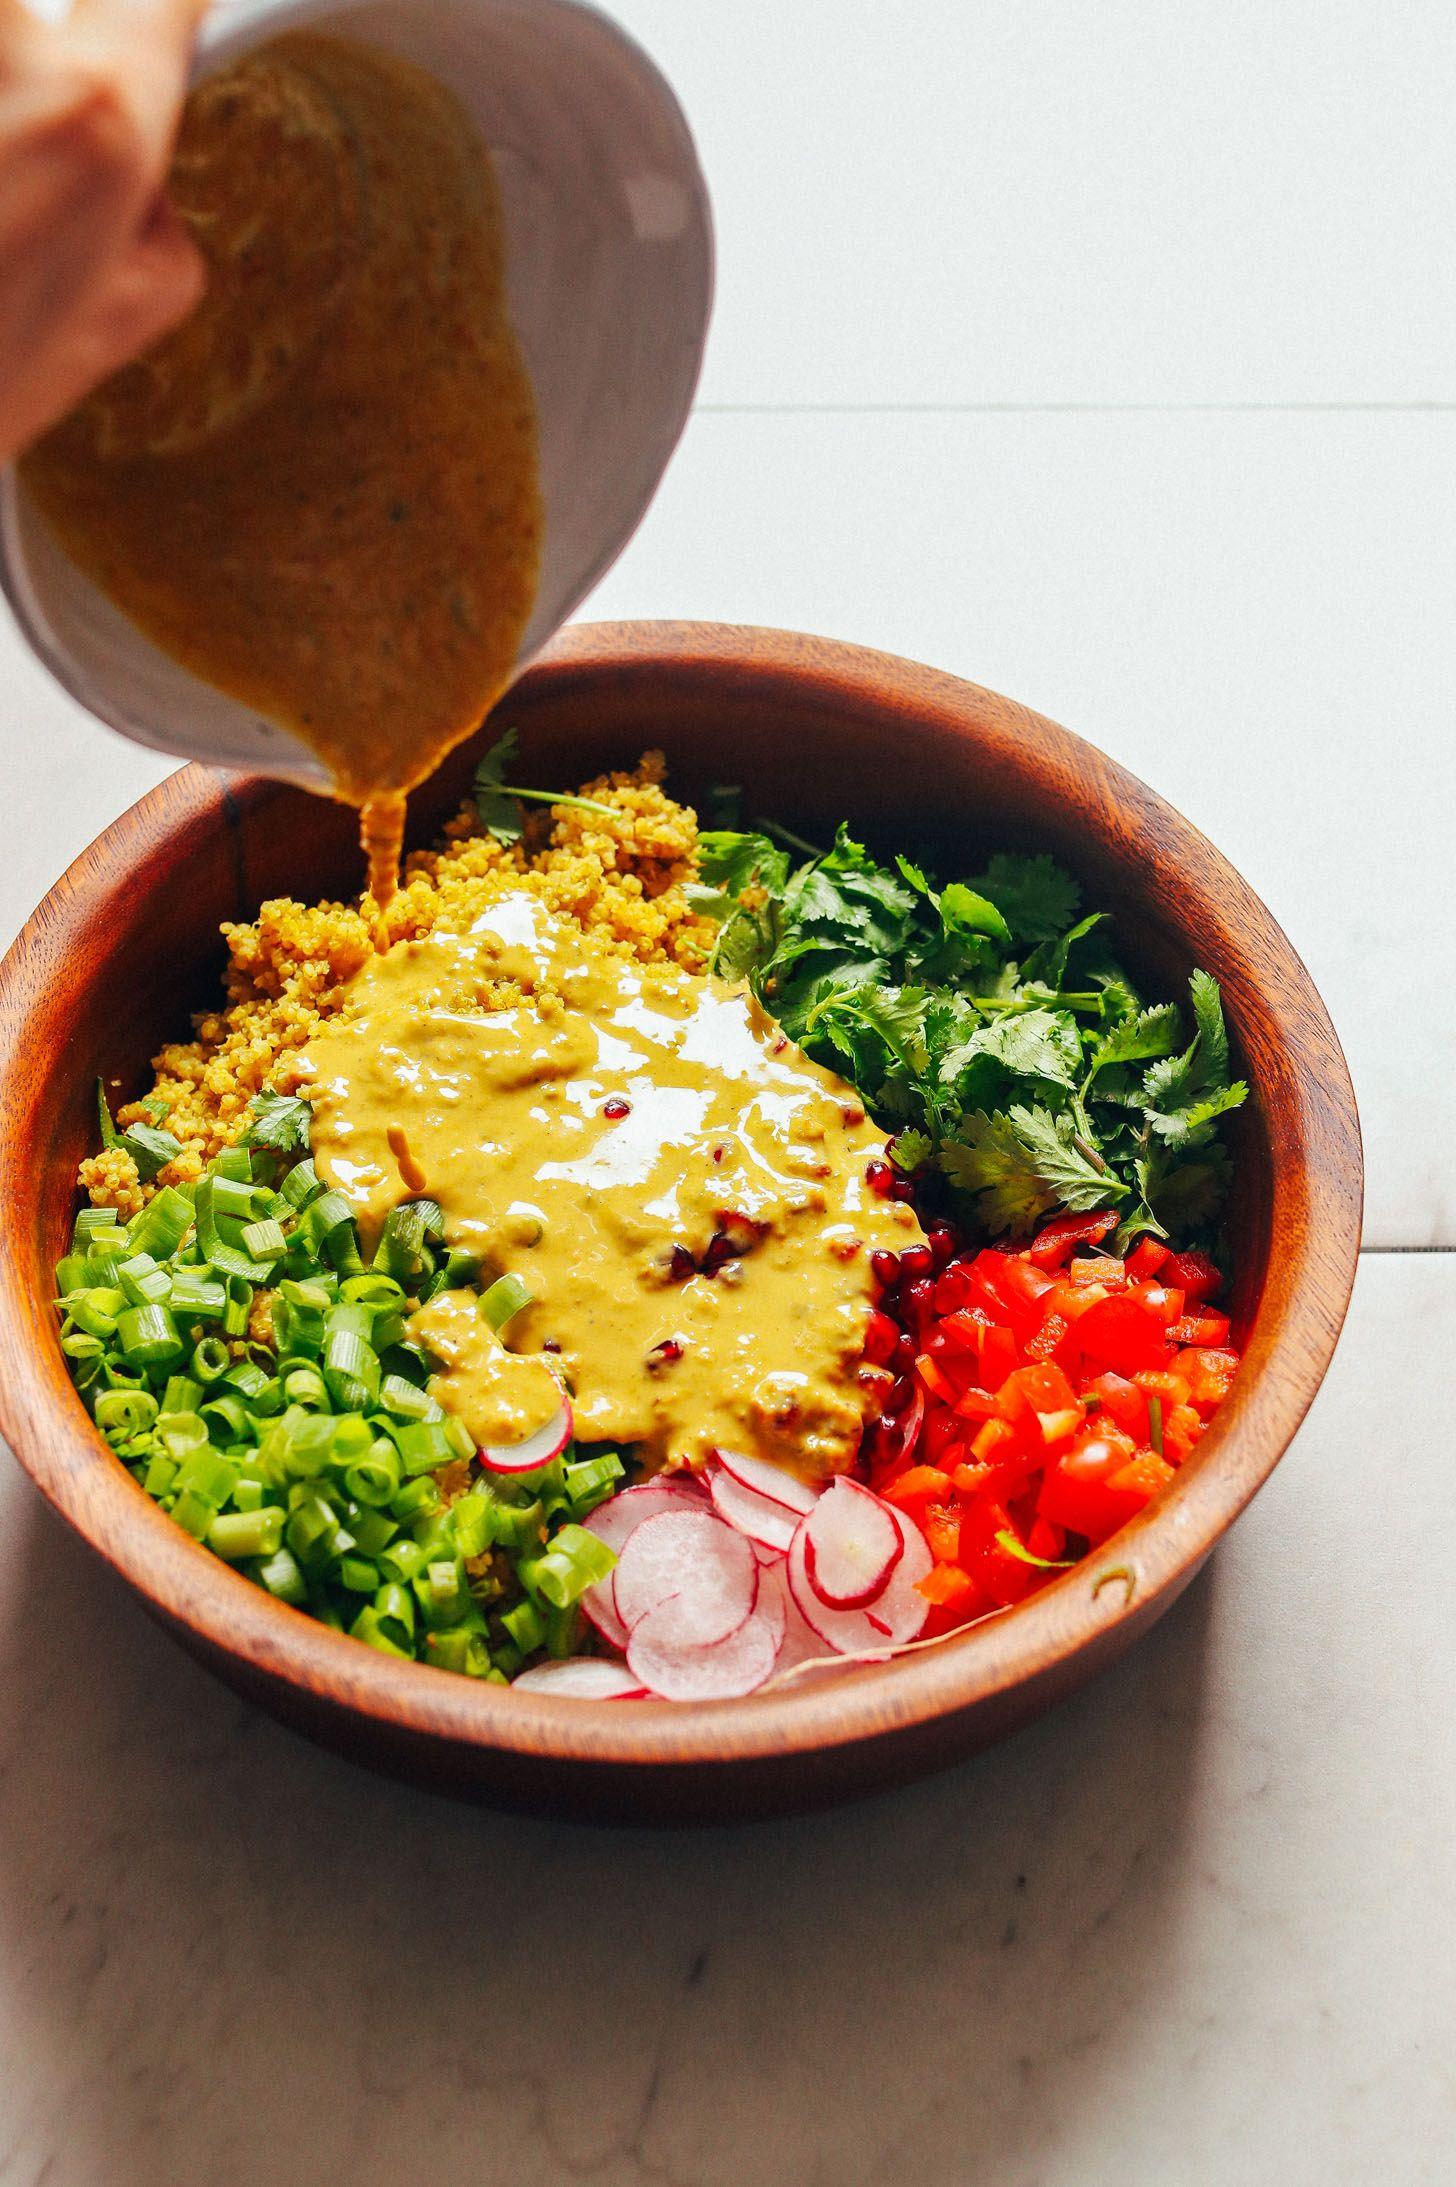 Curried Quinoa Salad Minimalist Baker Recipes Recipe Quinoa Salad Recipes Quinoa Salad Salad Recipes